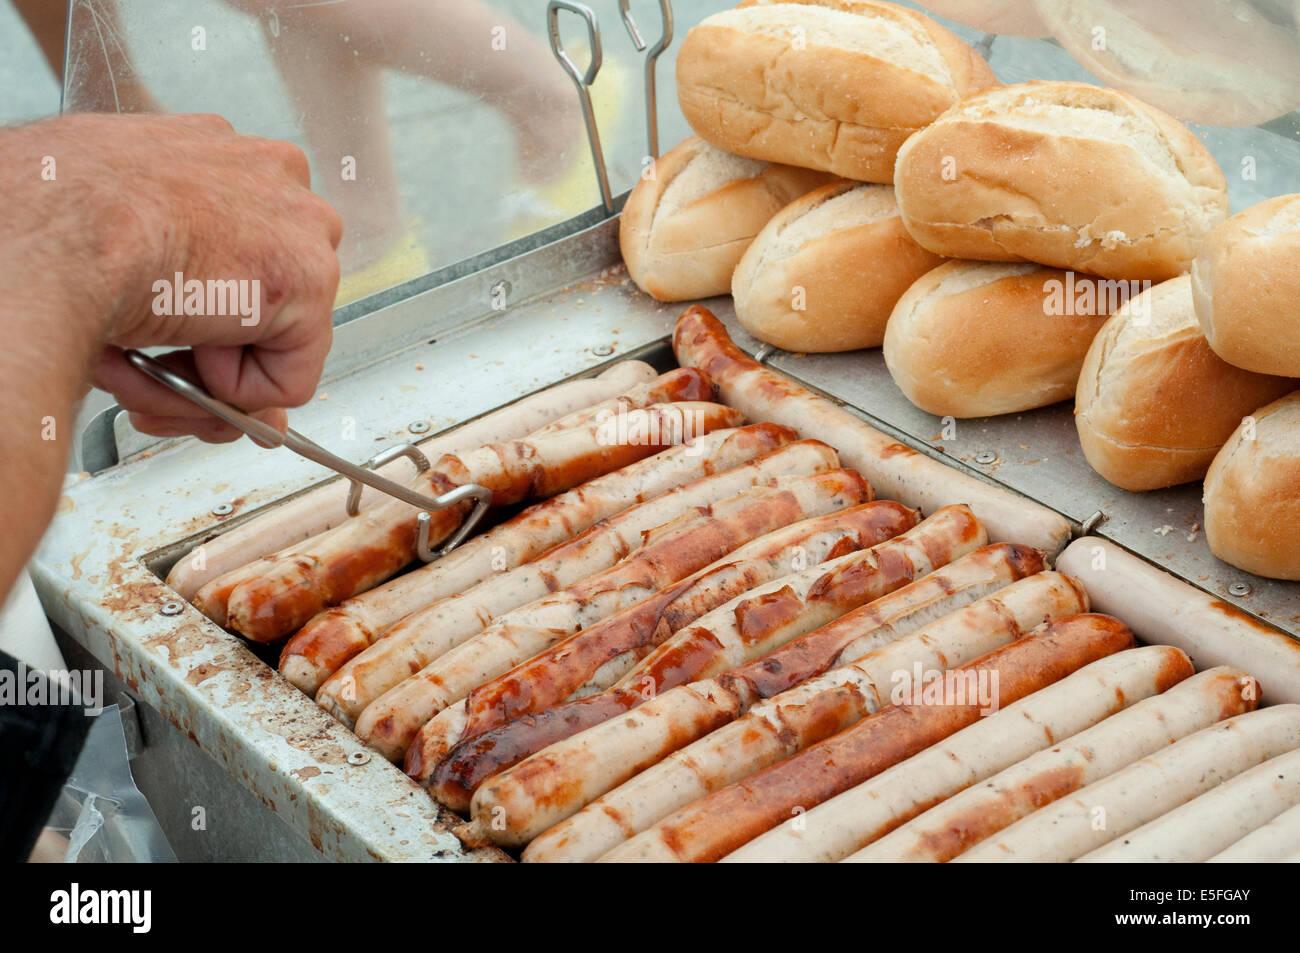 germany berlin wurstel stall hot dog stall stock photo 72256883 alamy. Black Bedroom Furniture Sets. Home Design Ideas